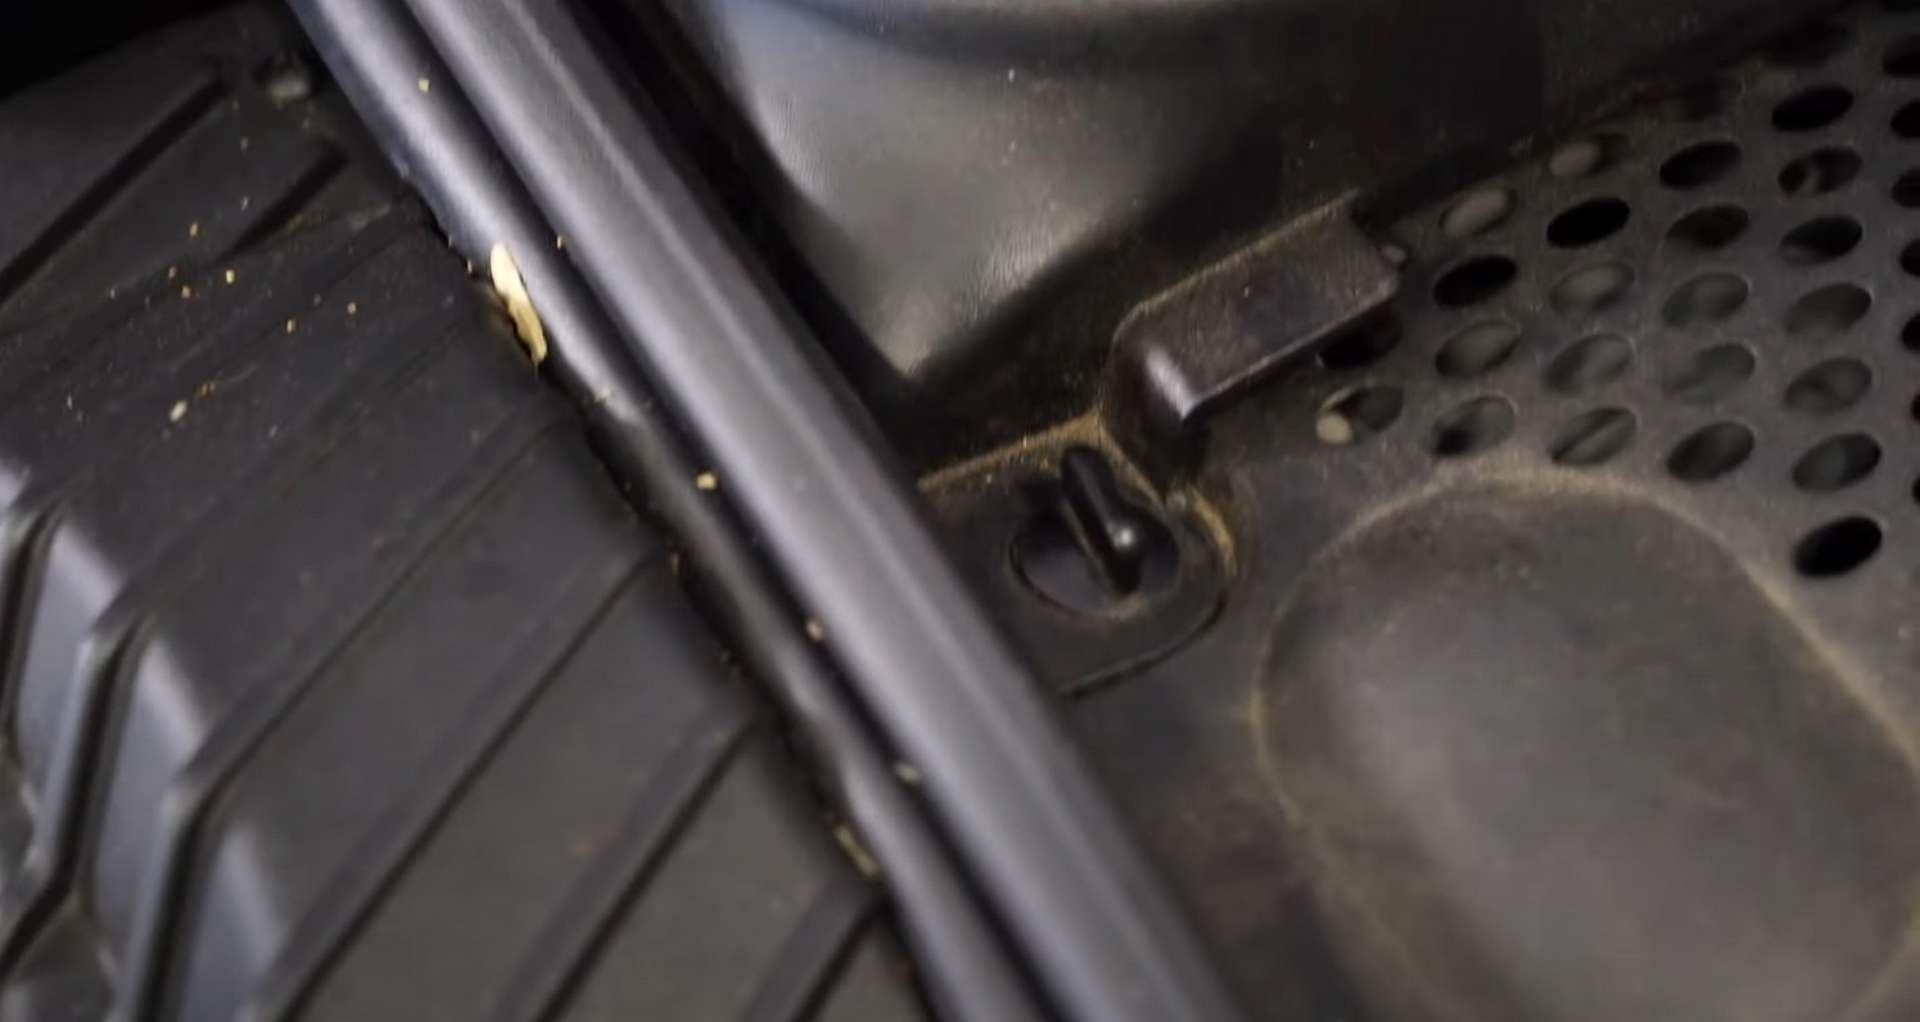 03-DIY-Porsche-996-Cabin-Filter_Accesssing-Filter